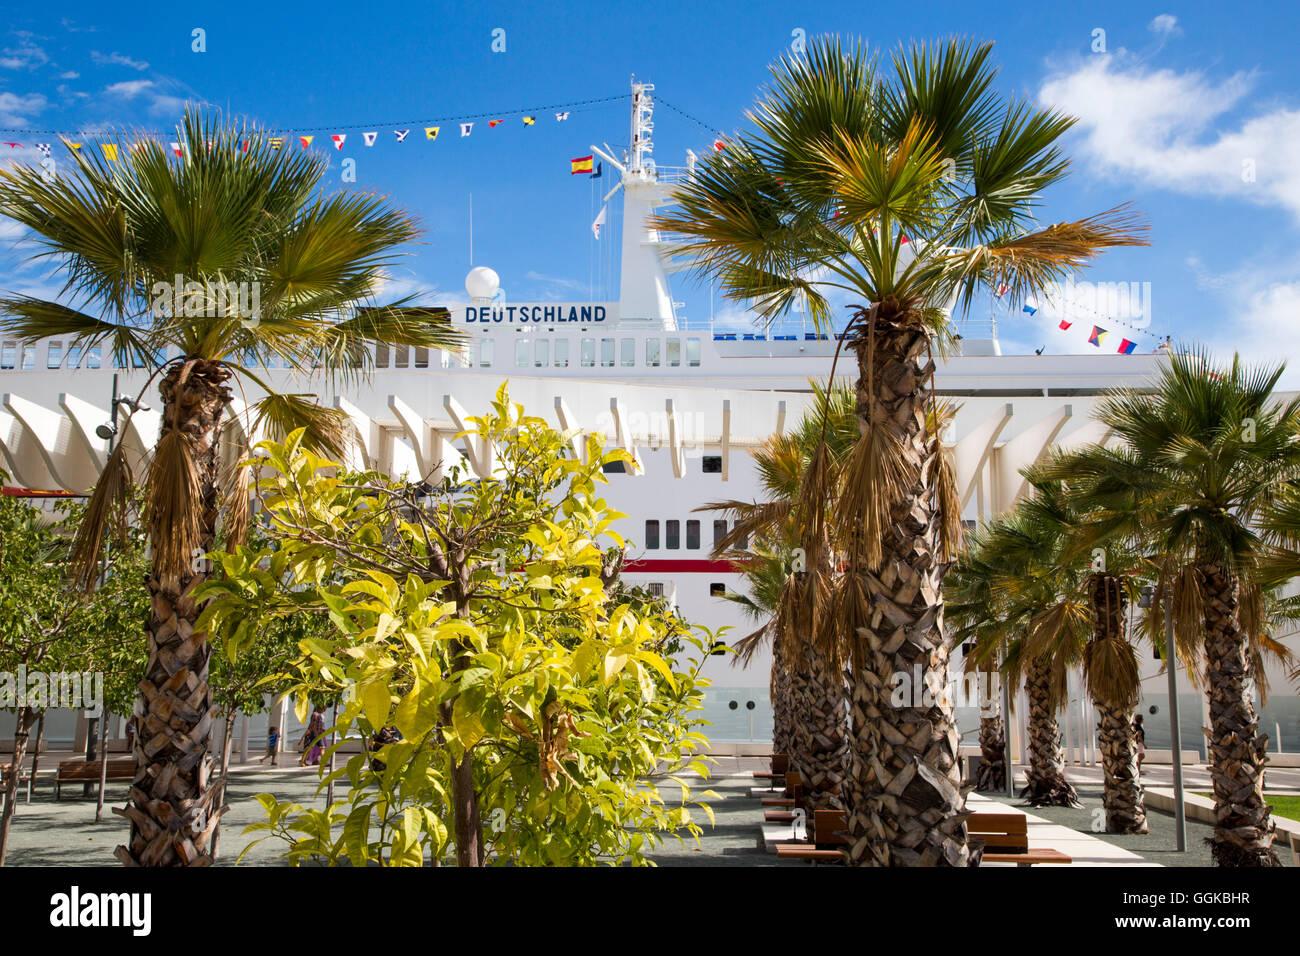 Palm trees and cruise ship MS Deutschland (Reederei Peter Deilmann), Malaga, Andalusia, Spain - Stock Image